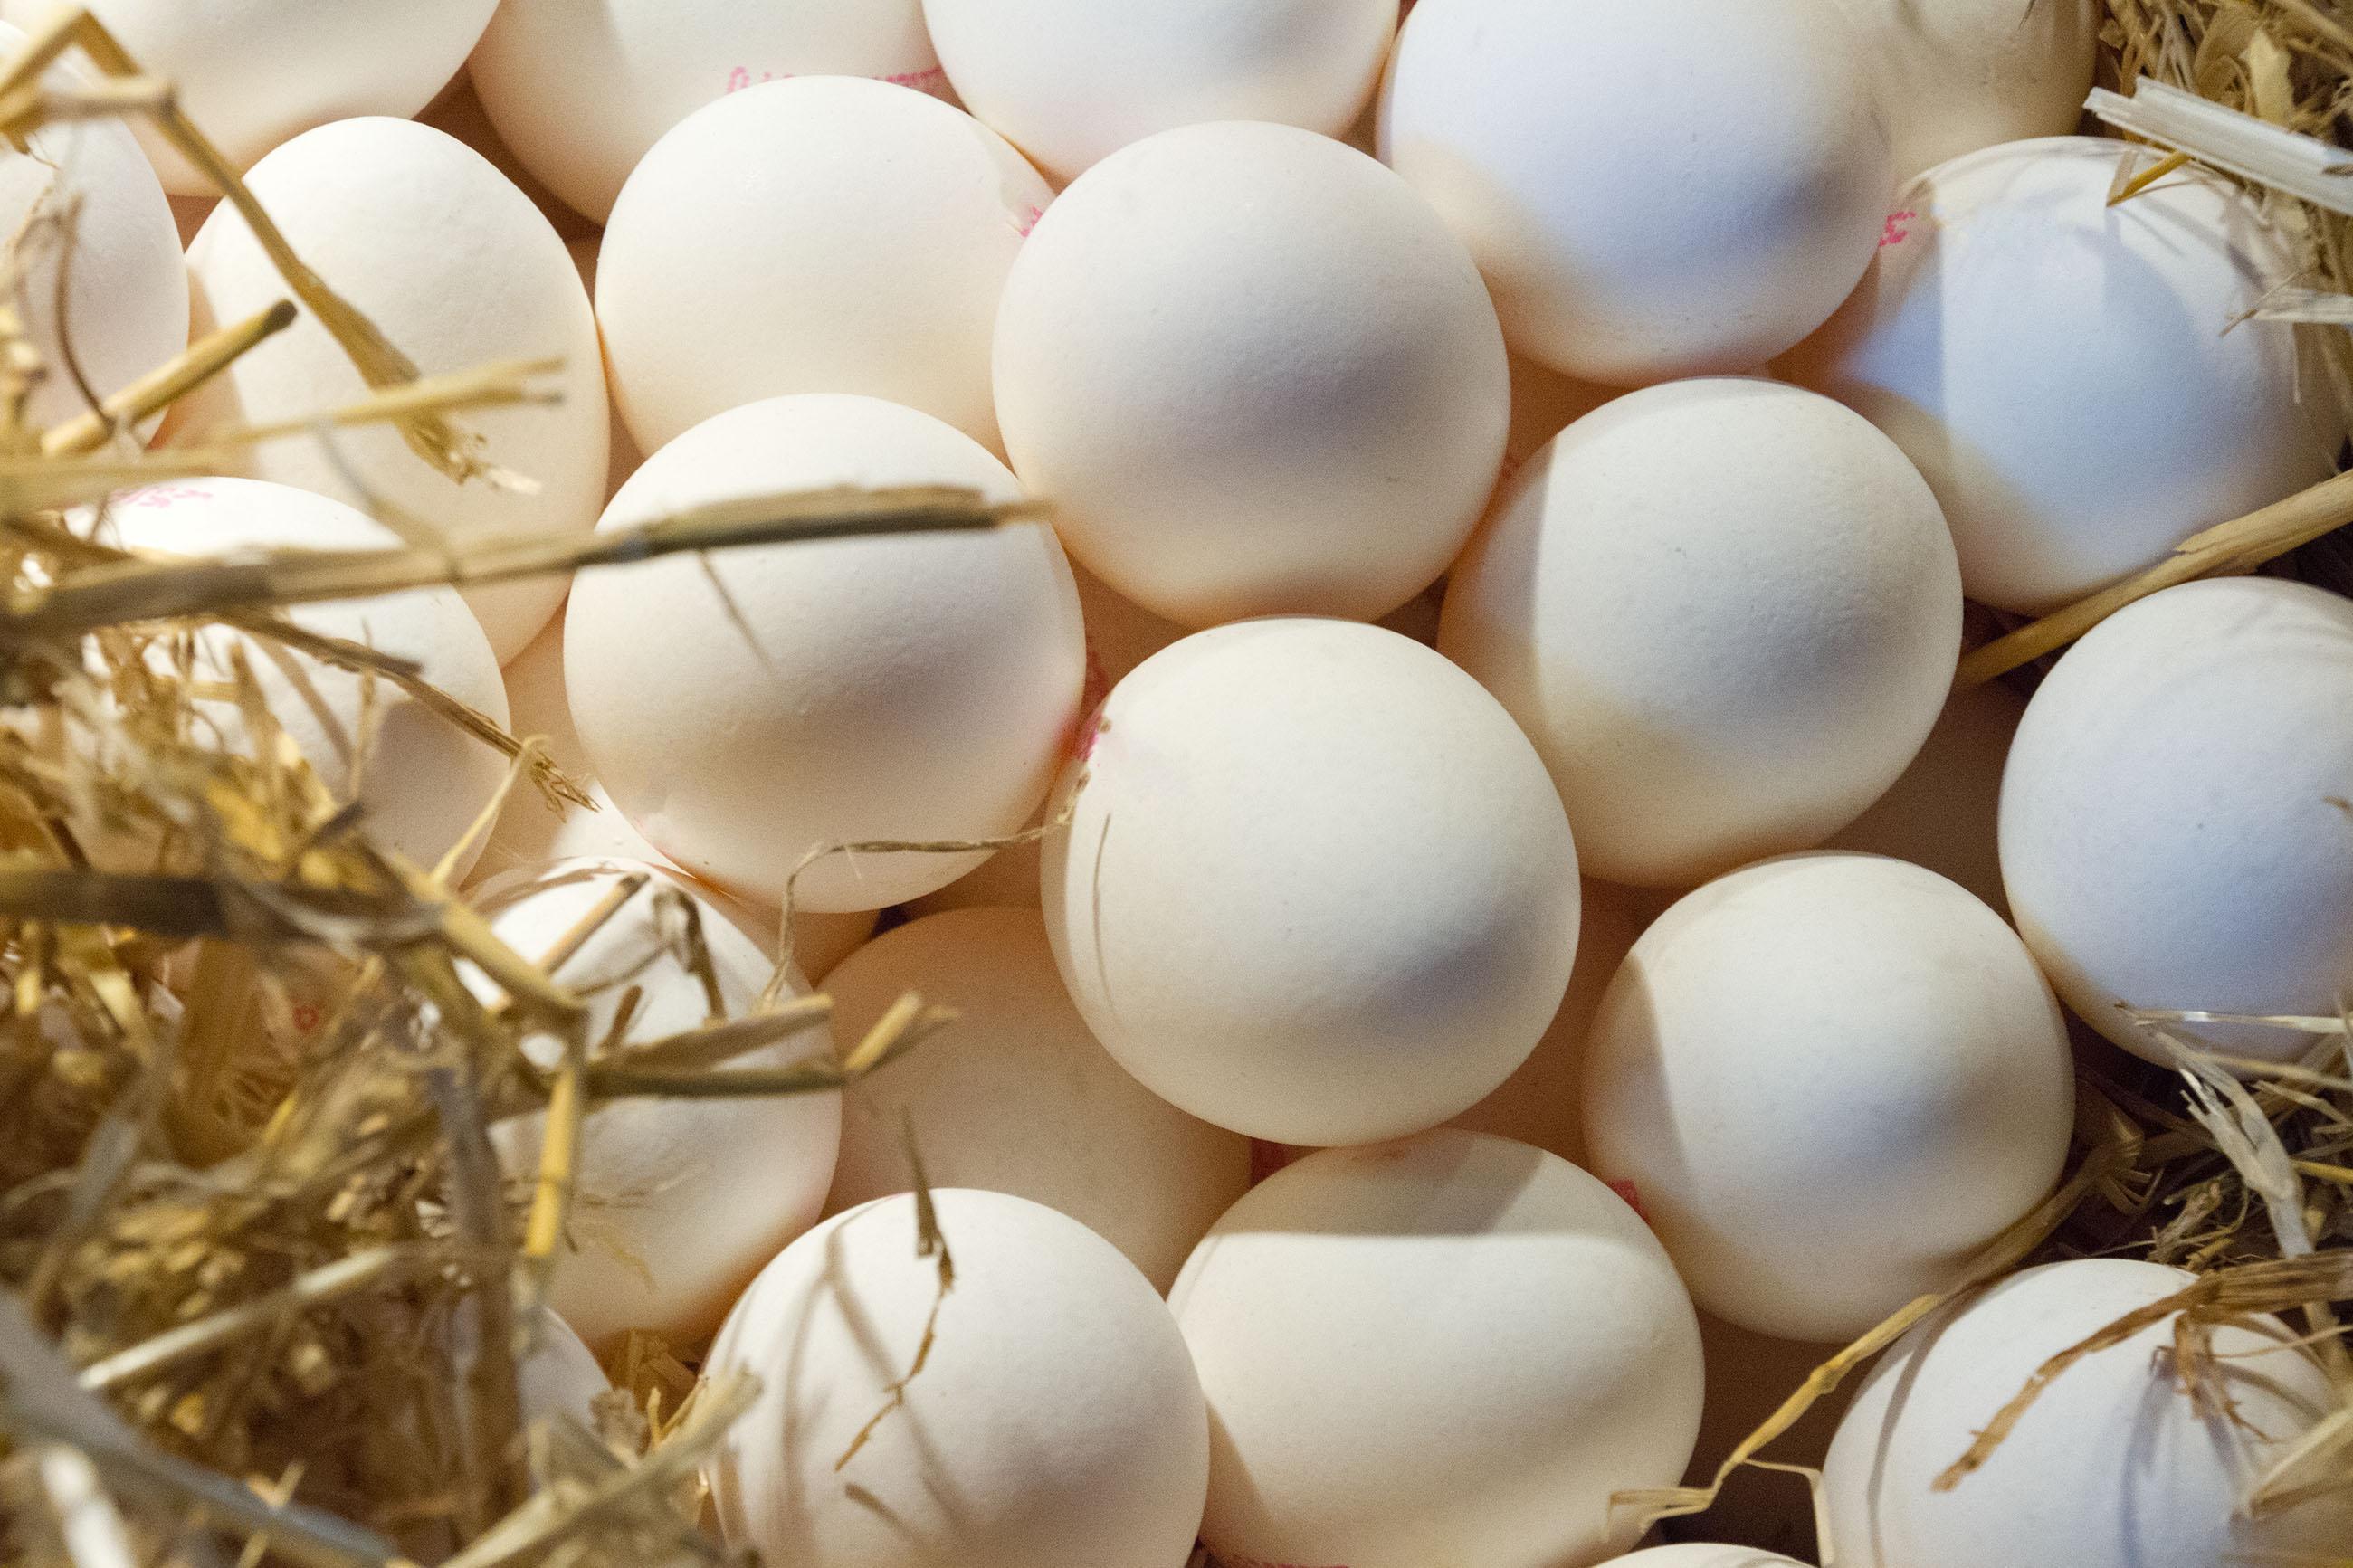 Fresh eggs on straw photo